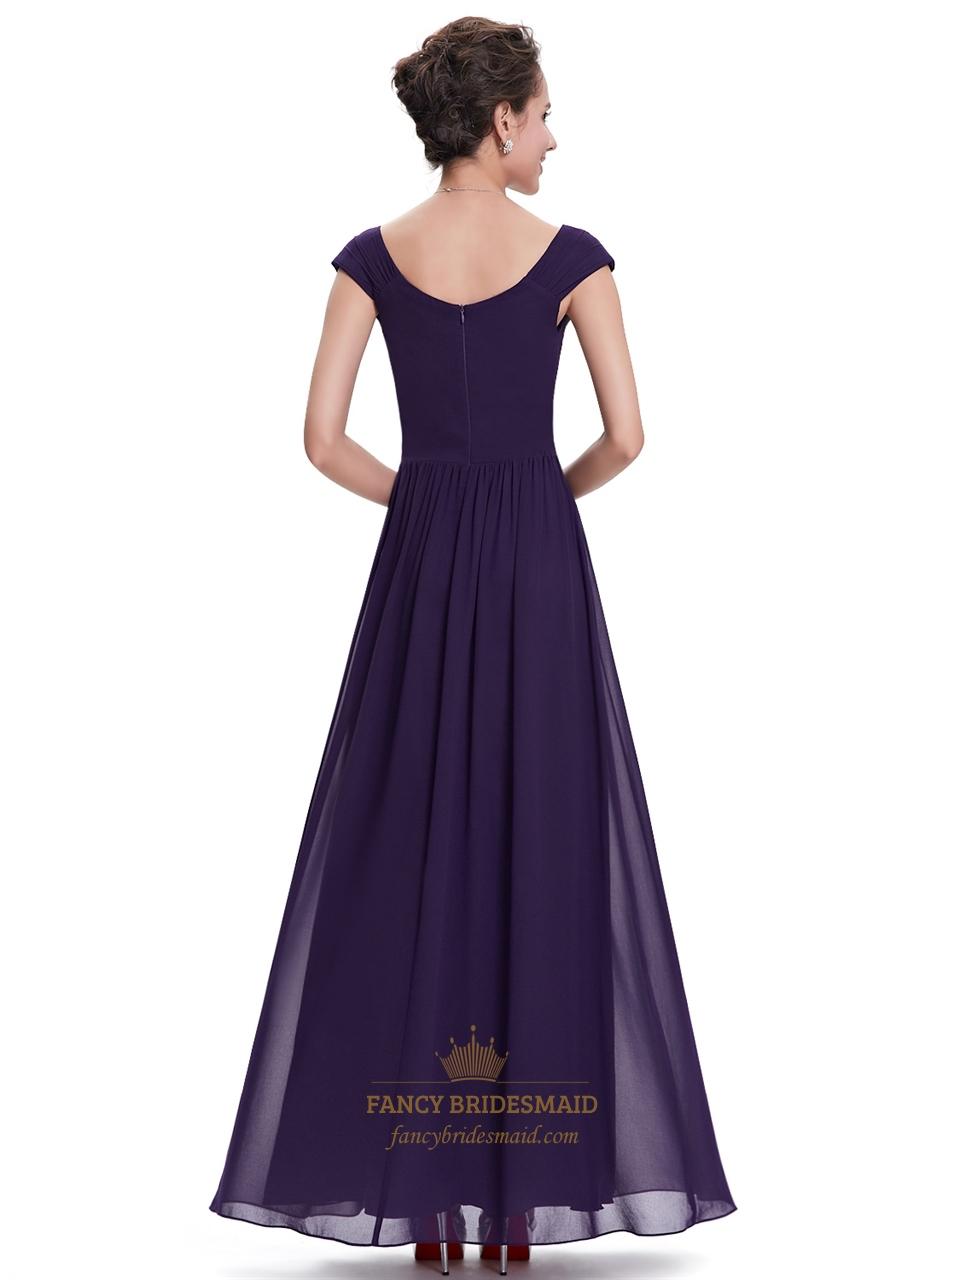 purple sweetheart chiffon cap sleeves bridesmaid dresses